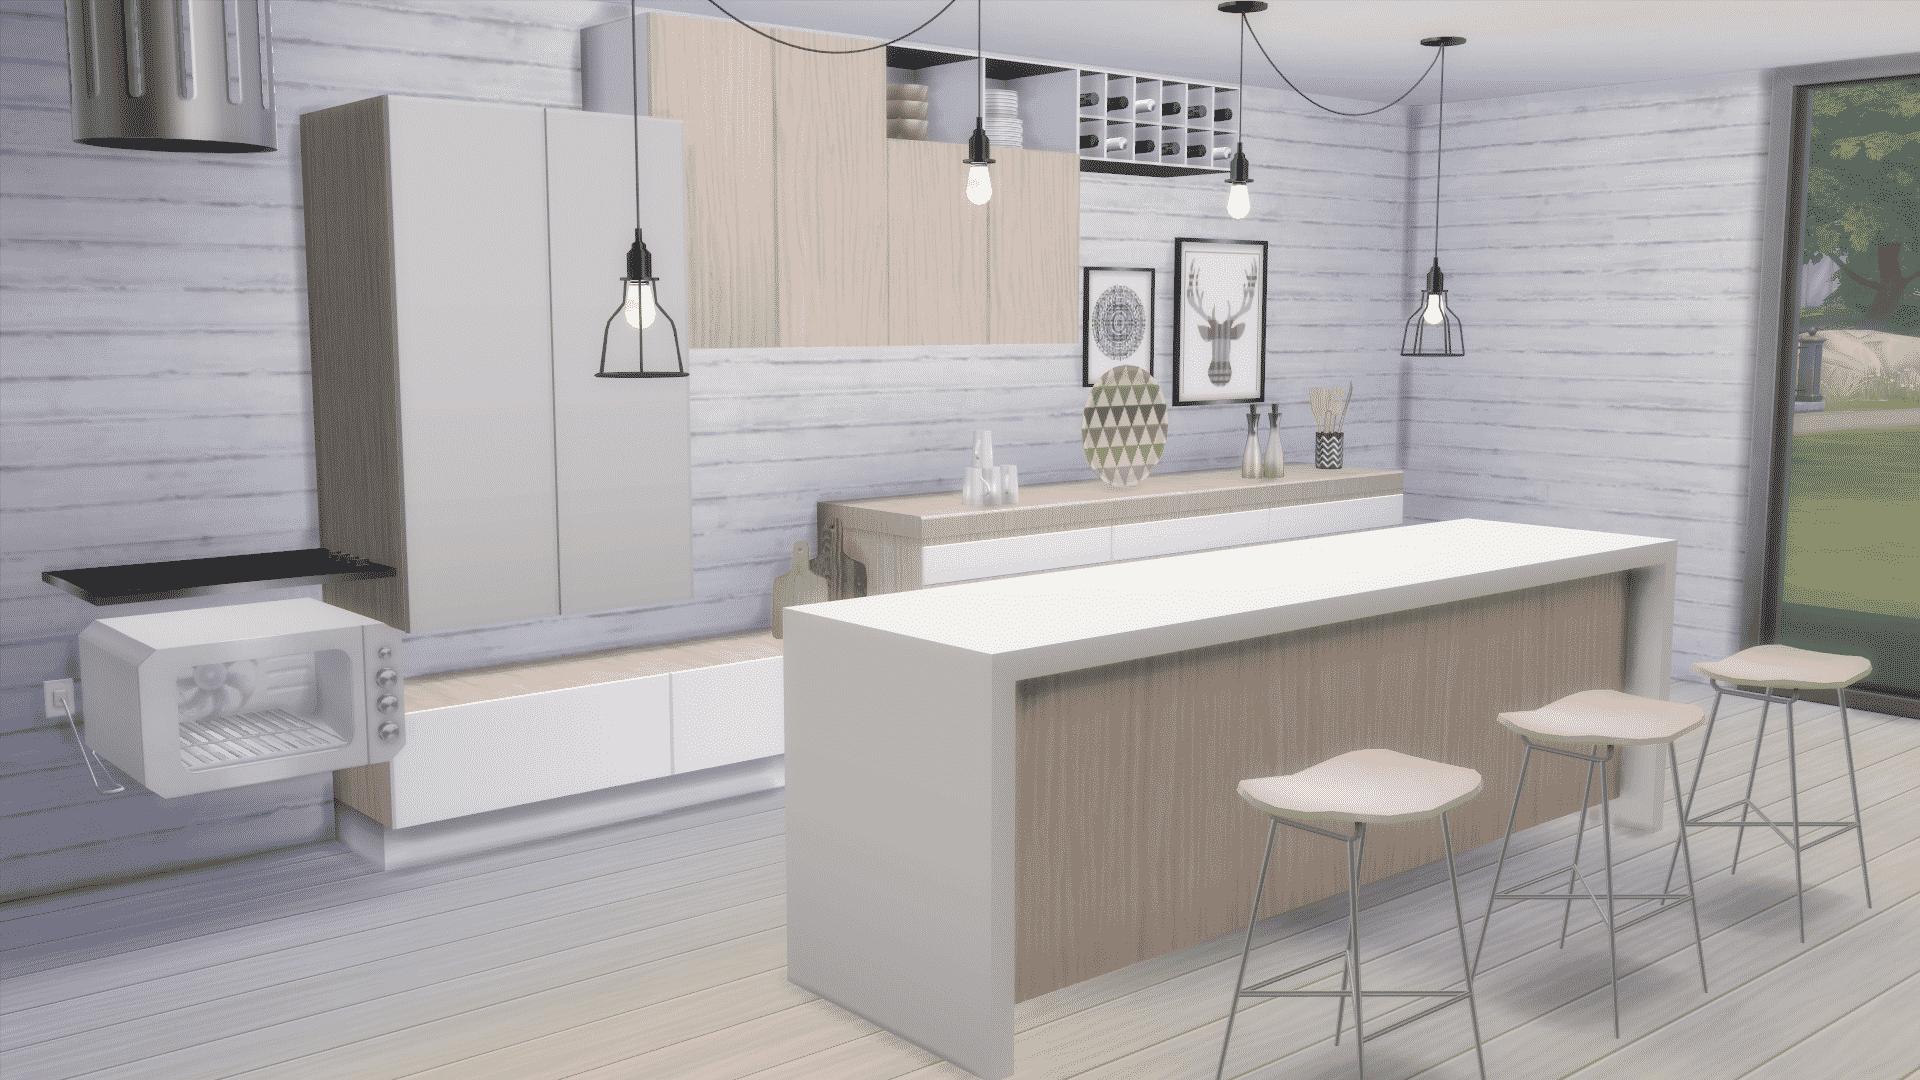 The Sims 4 Custom Content Spotlight Kitchen Sets